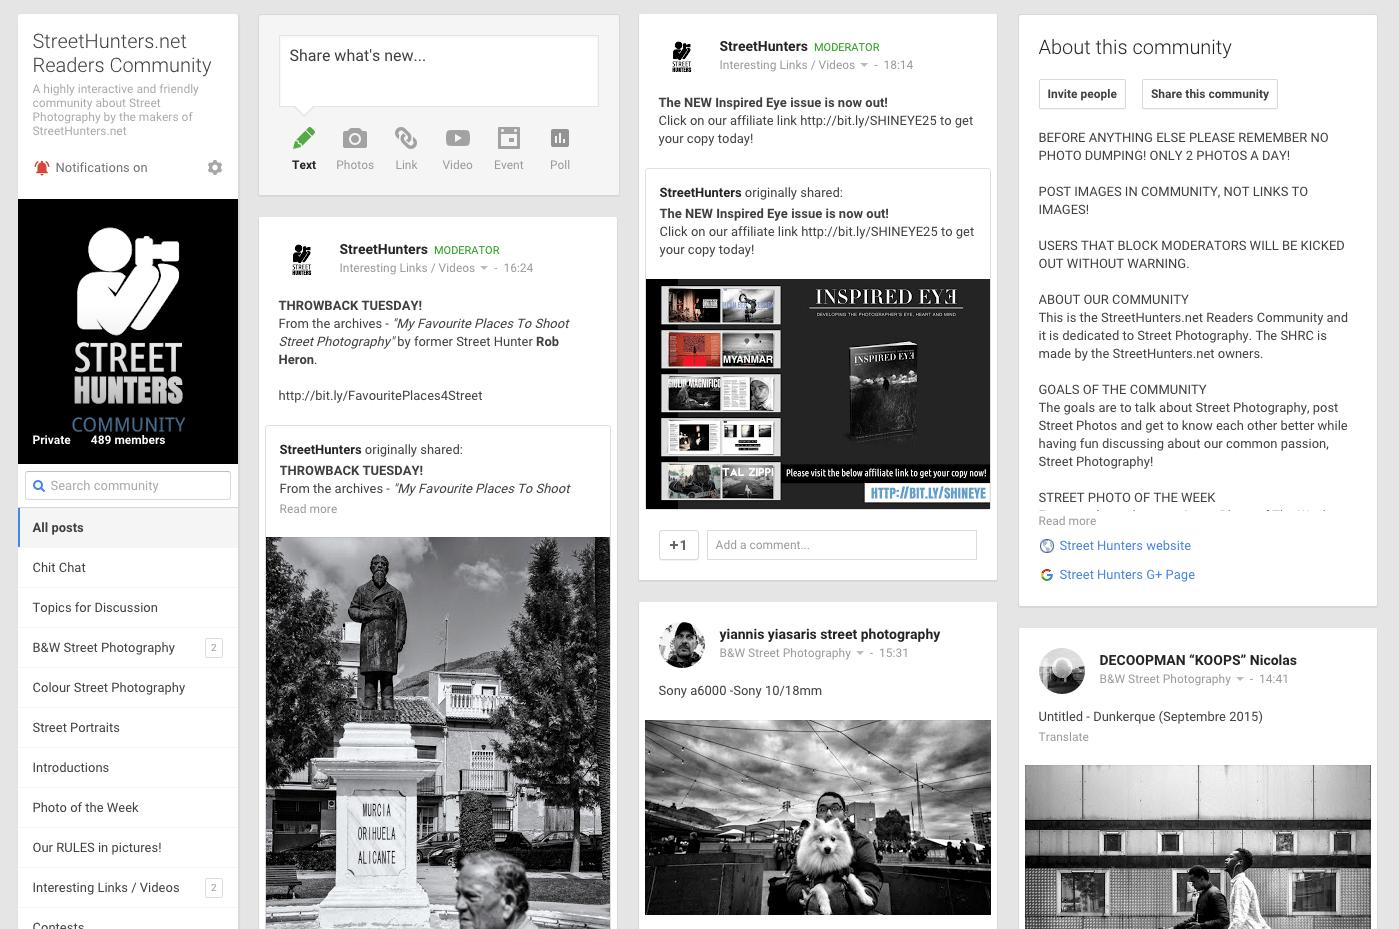 Street Hunters GooglePlus Community